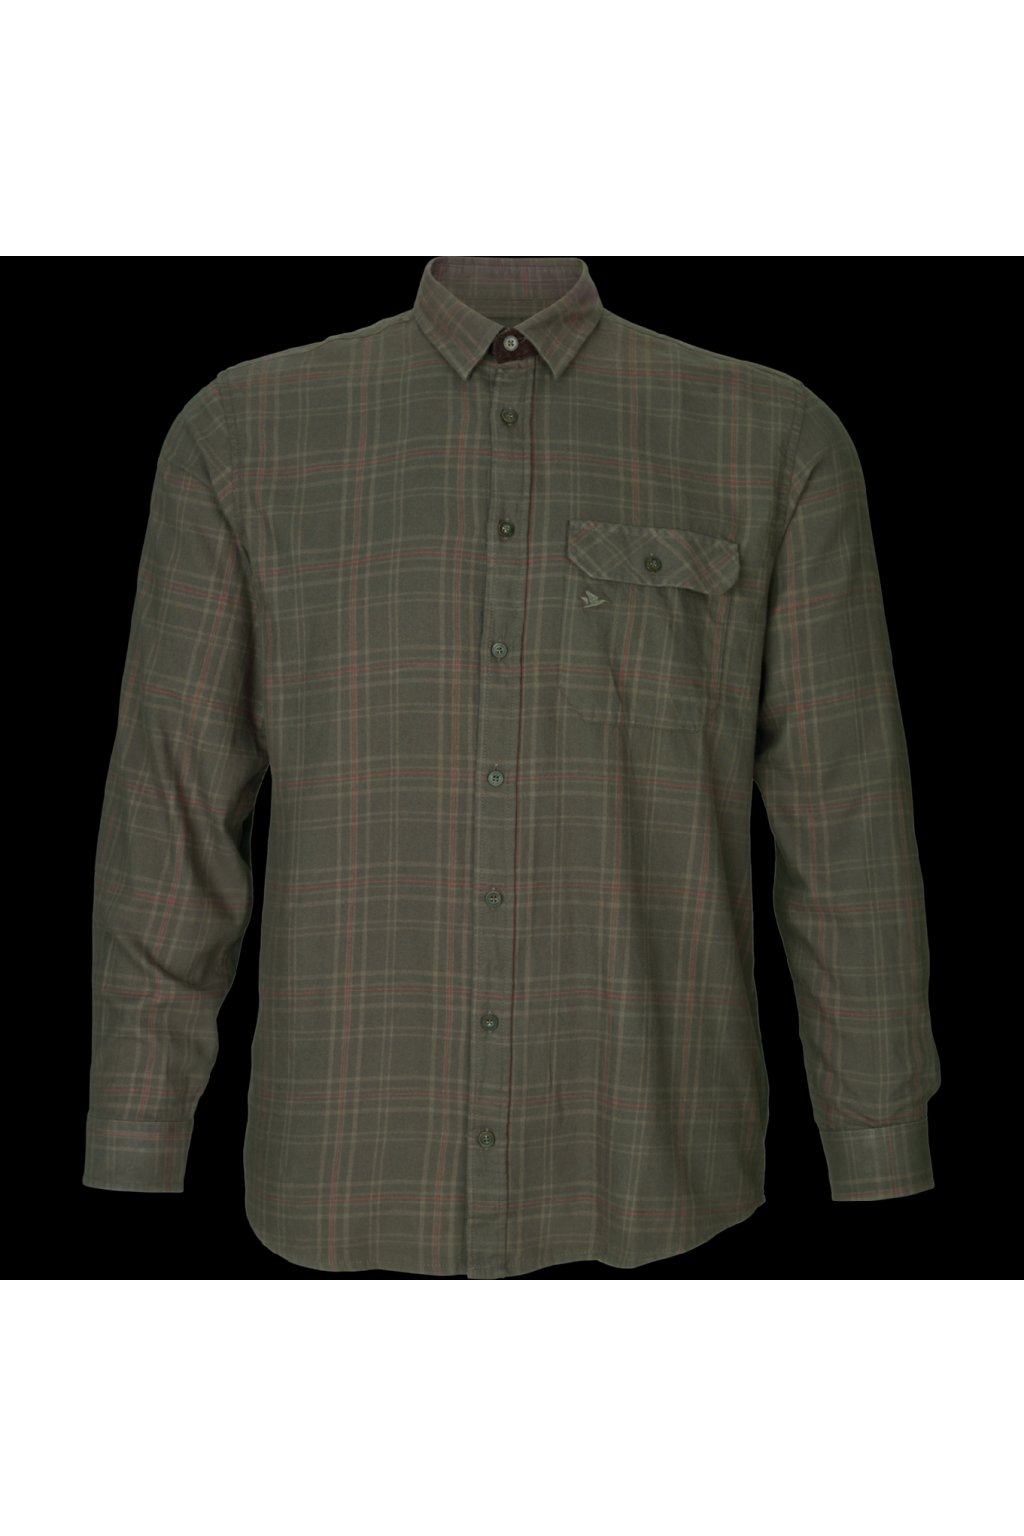 Seeland - Range košile pánská Wren check